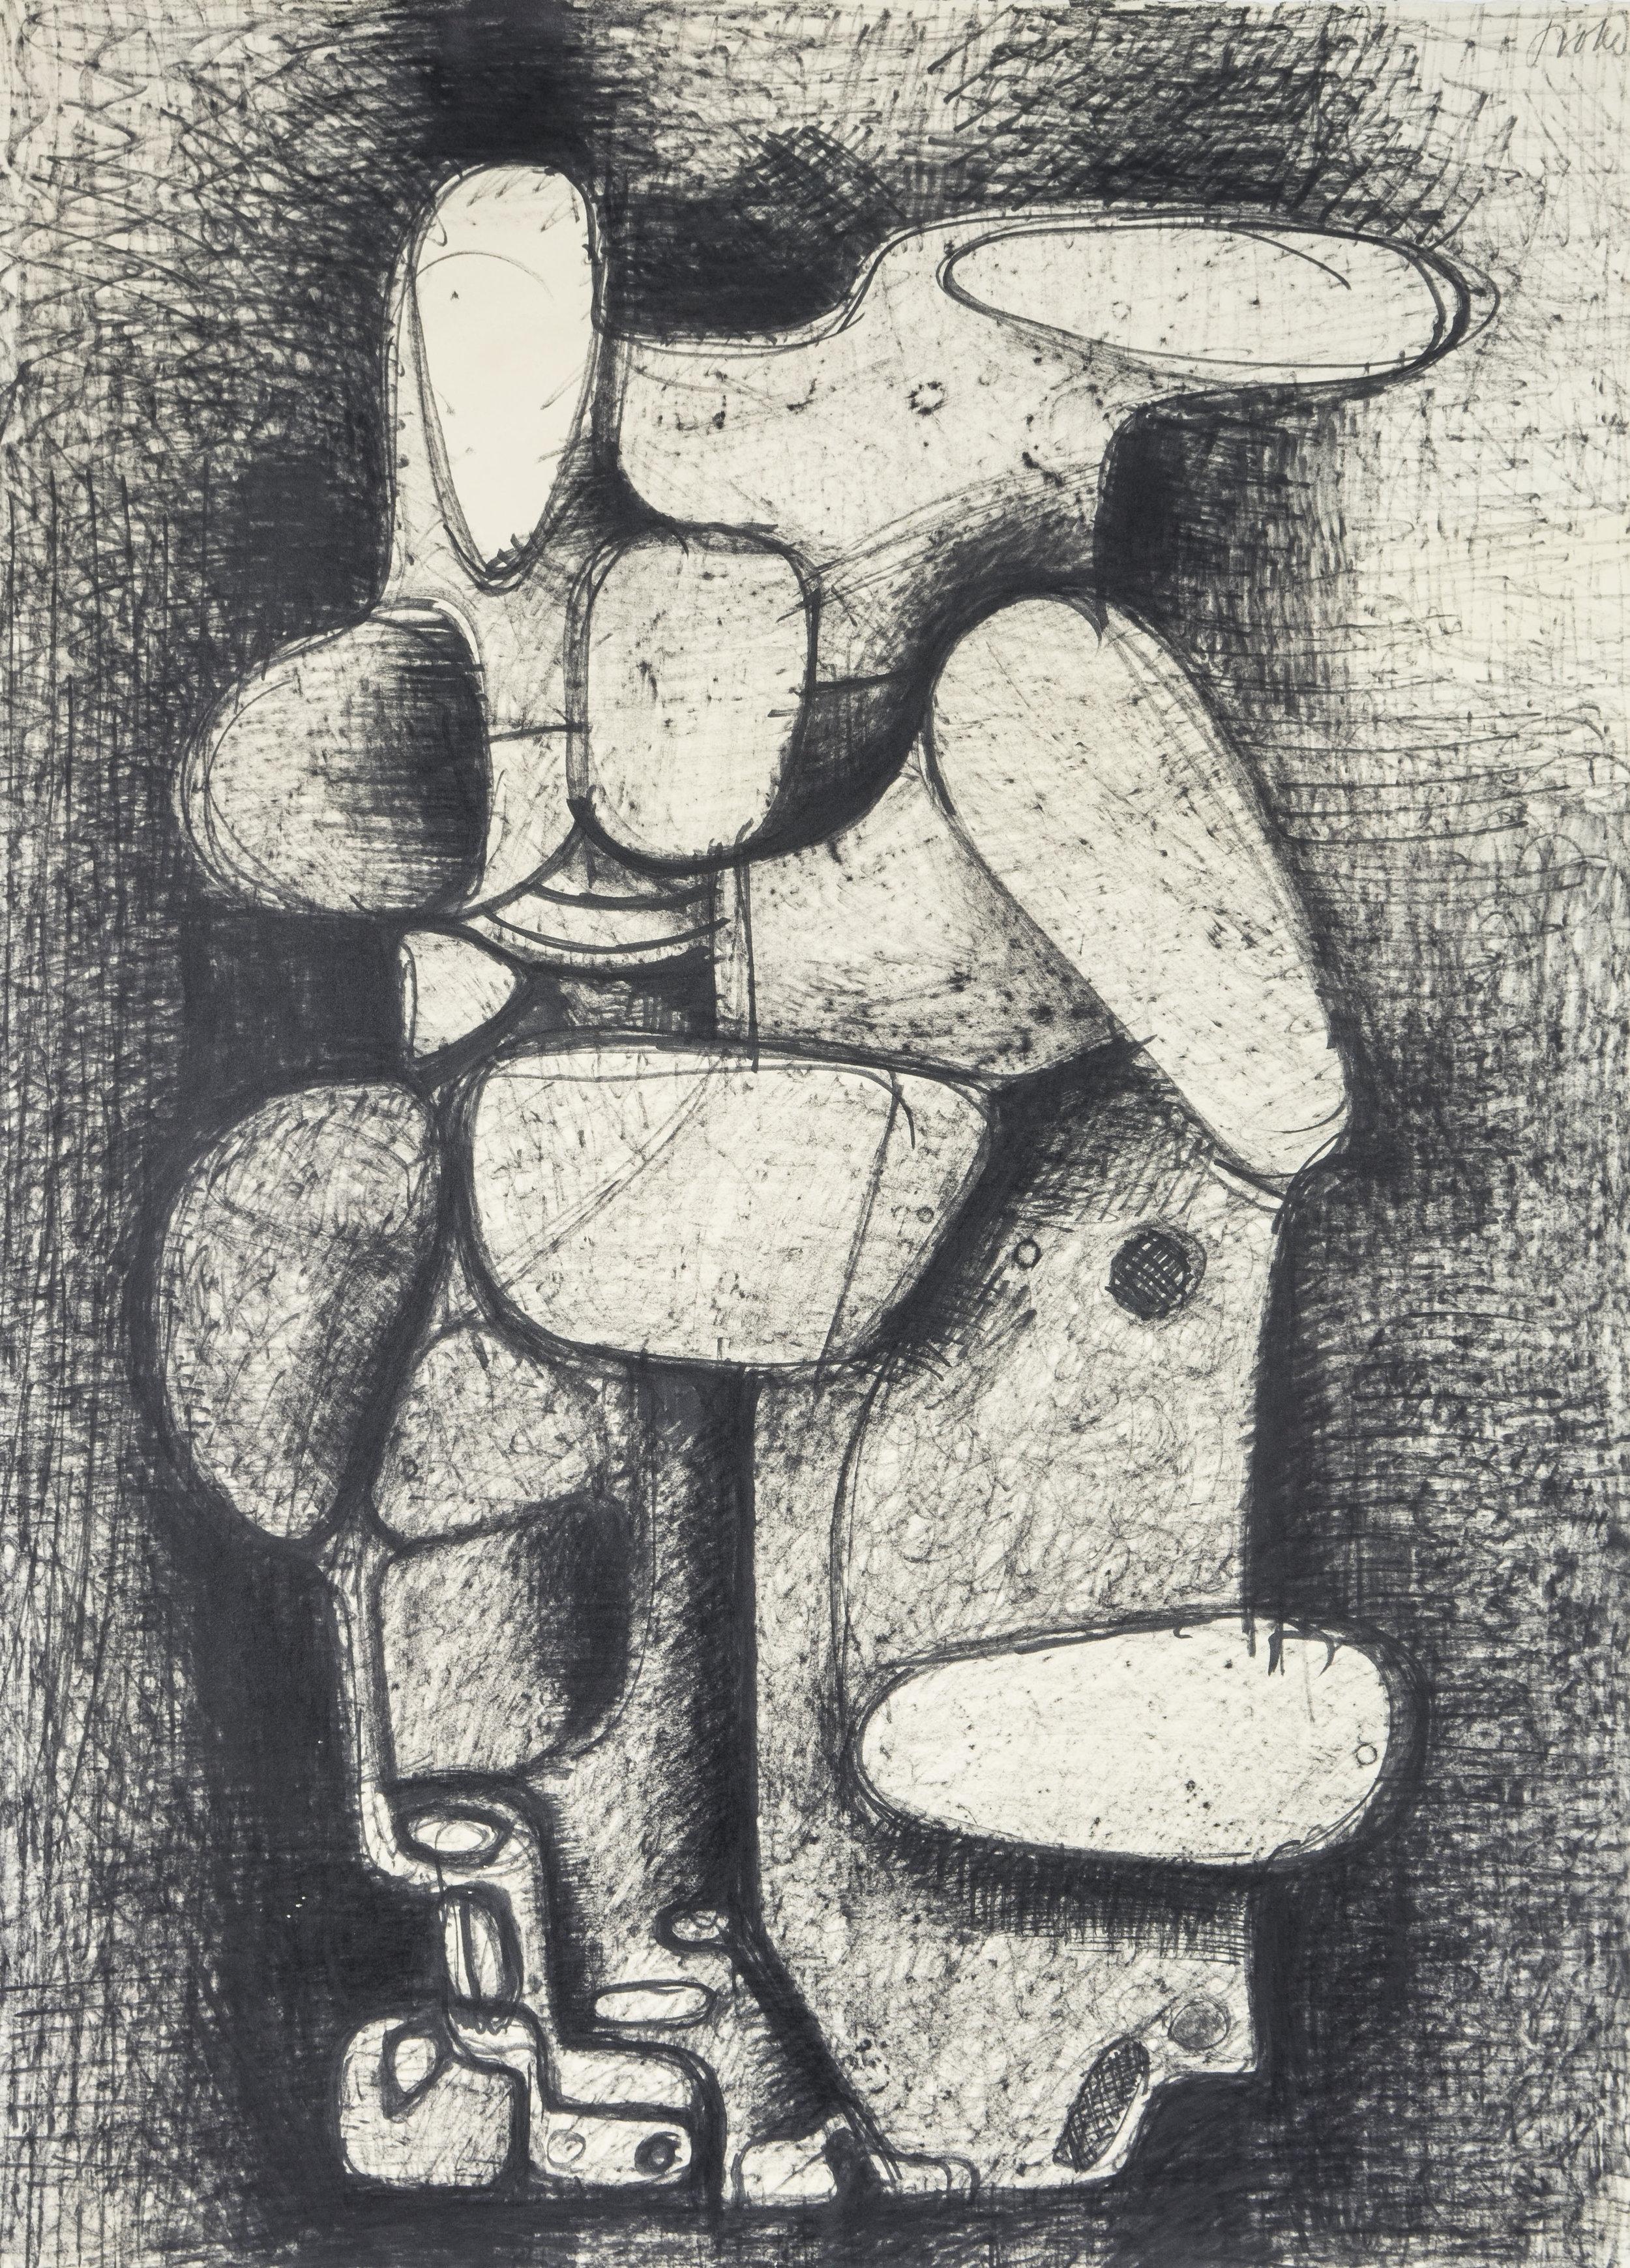 Troller-Untitled1963-205.jpg